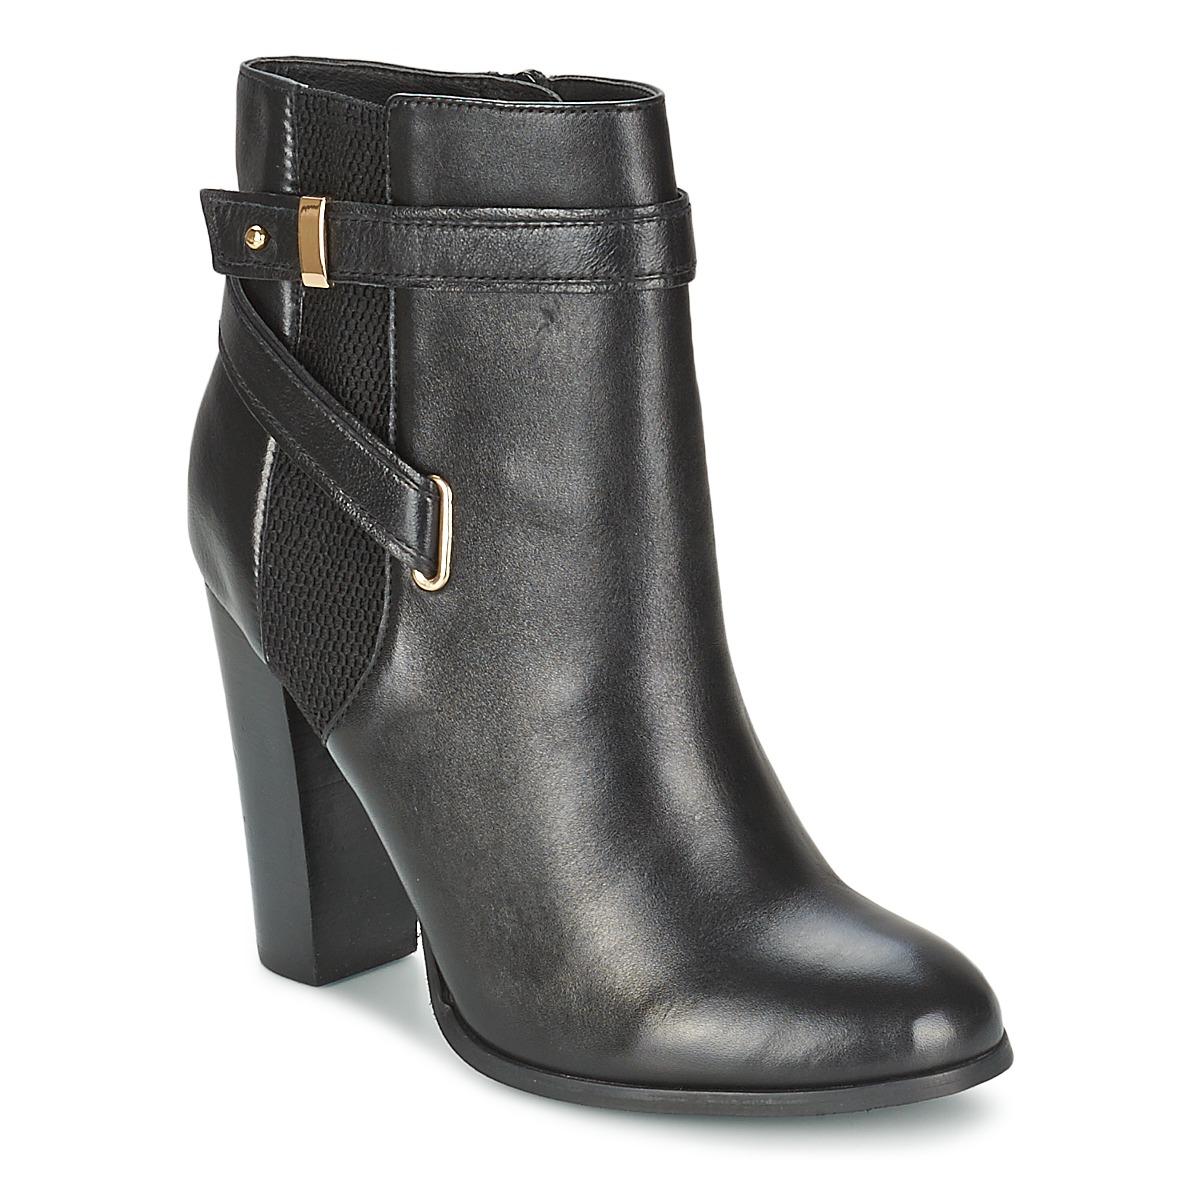 Aldo LAMPLEY Schwarz - Kostenloser Versand bei Spartoode ! - Schuhe Low Boots Damen 72,00 €